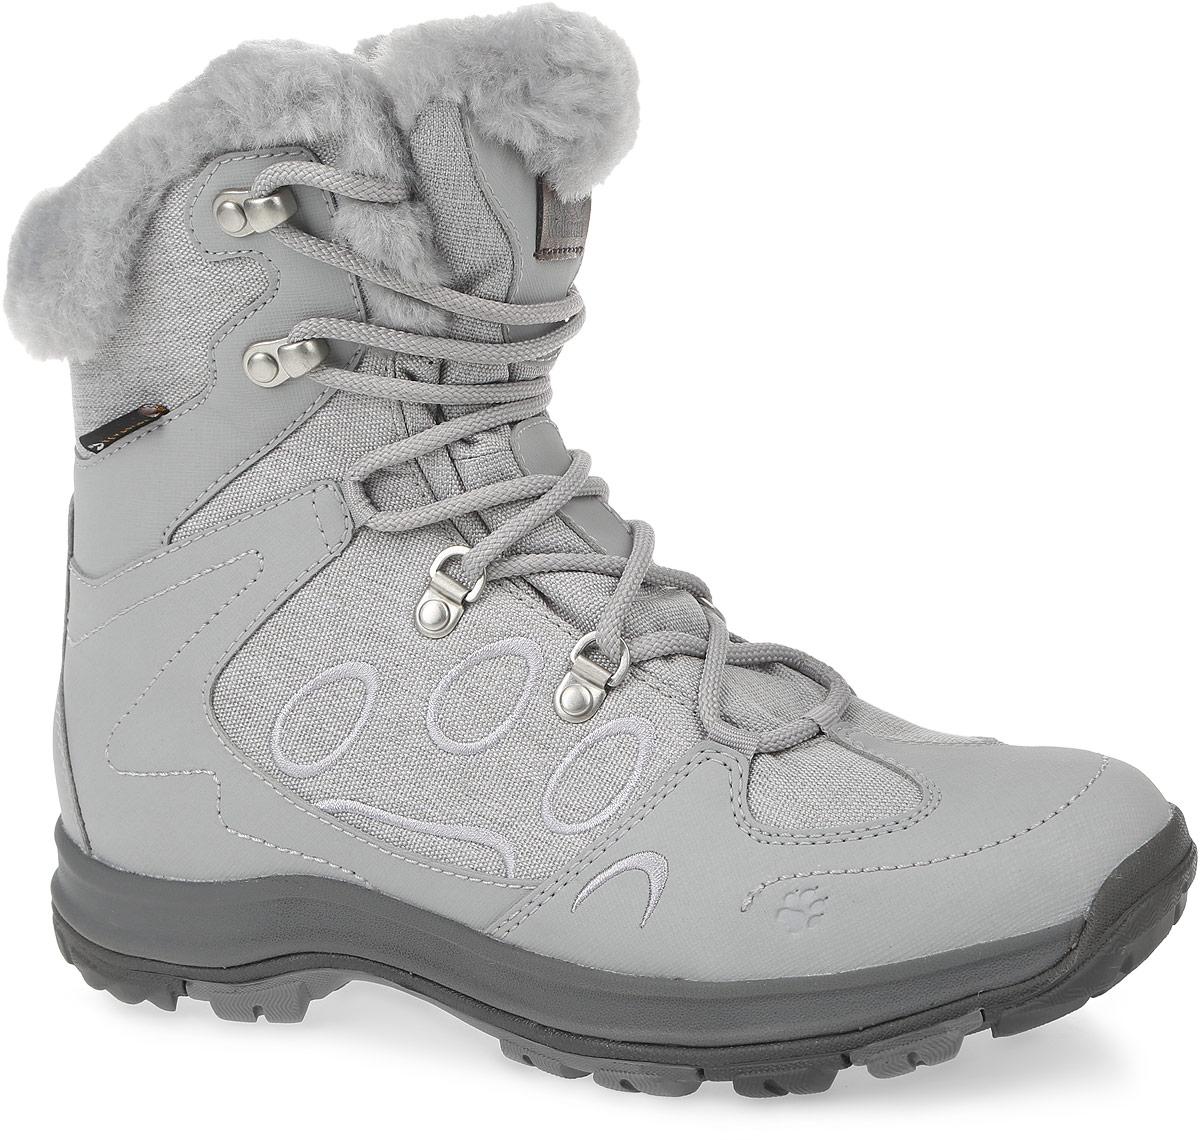 Ботинки Jack Wolfskin 4020531-6038